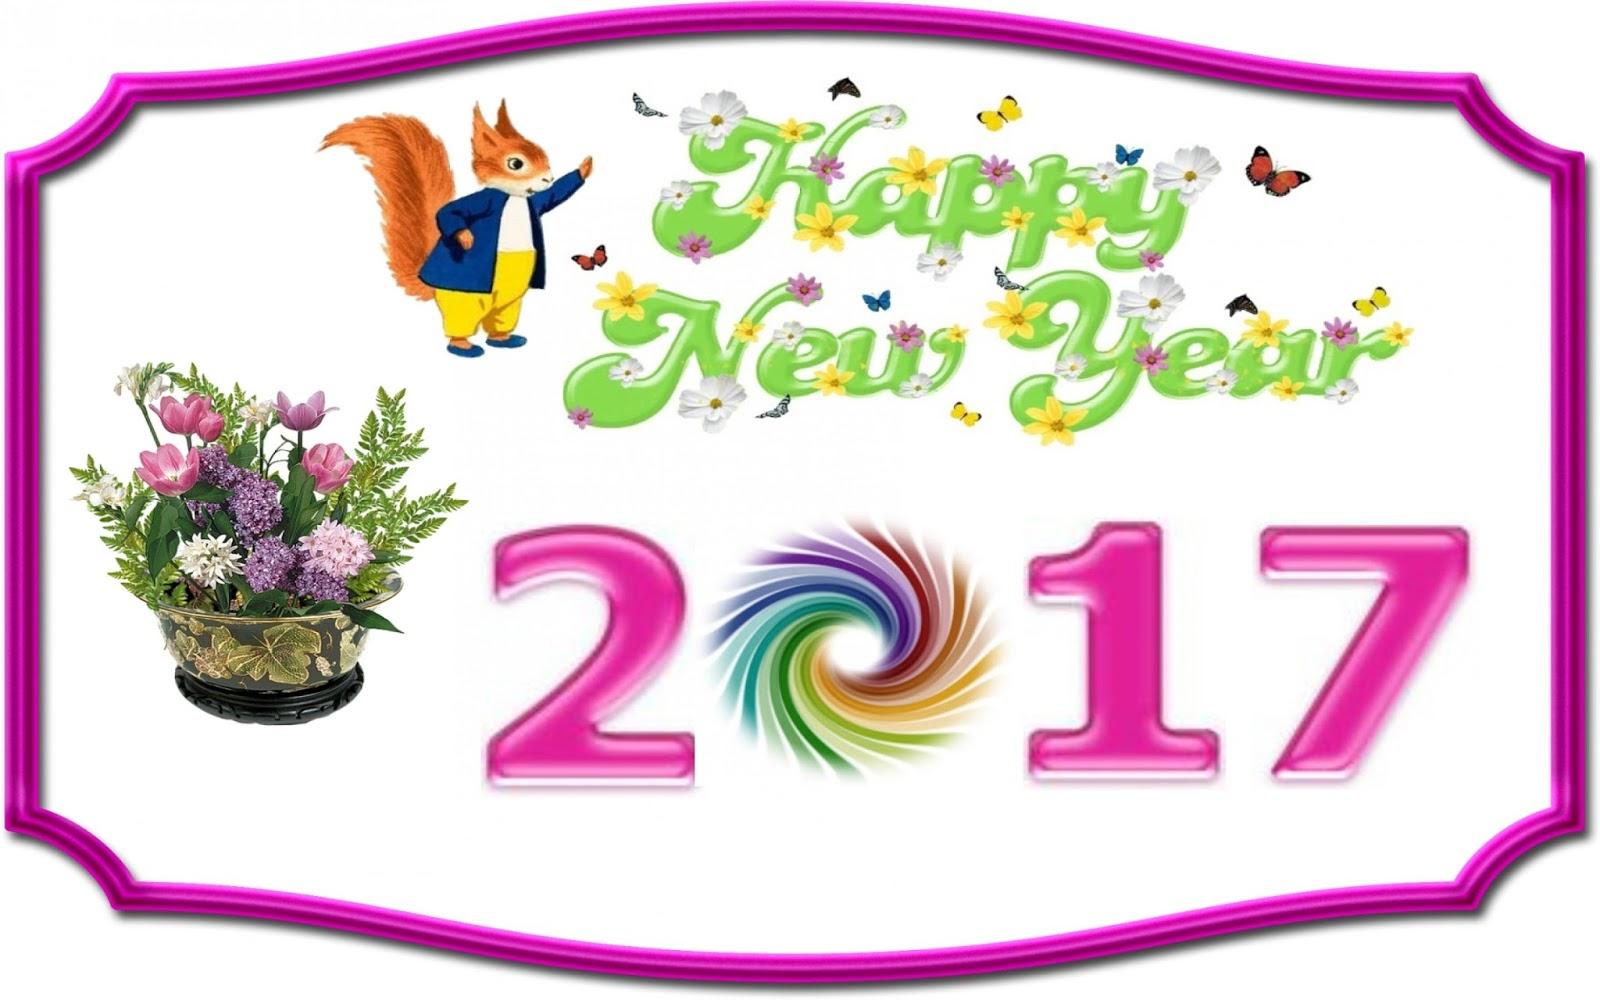 Happy Diwali Wallpaper 2017 - Diwalli Whatsapp Status, Videos ...